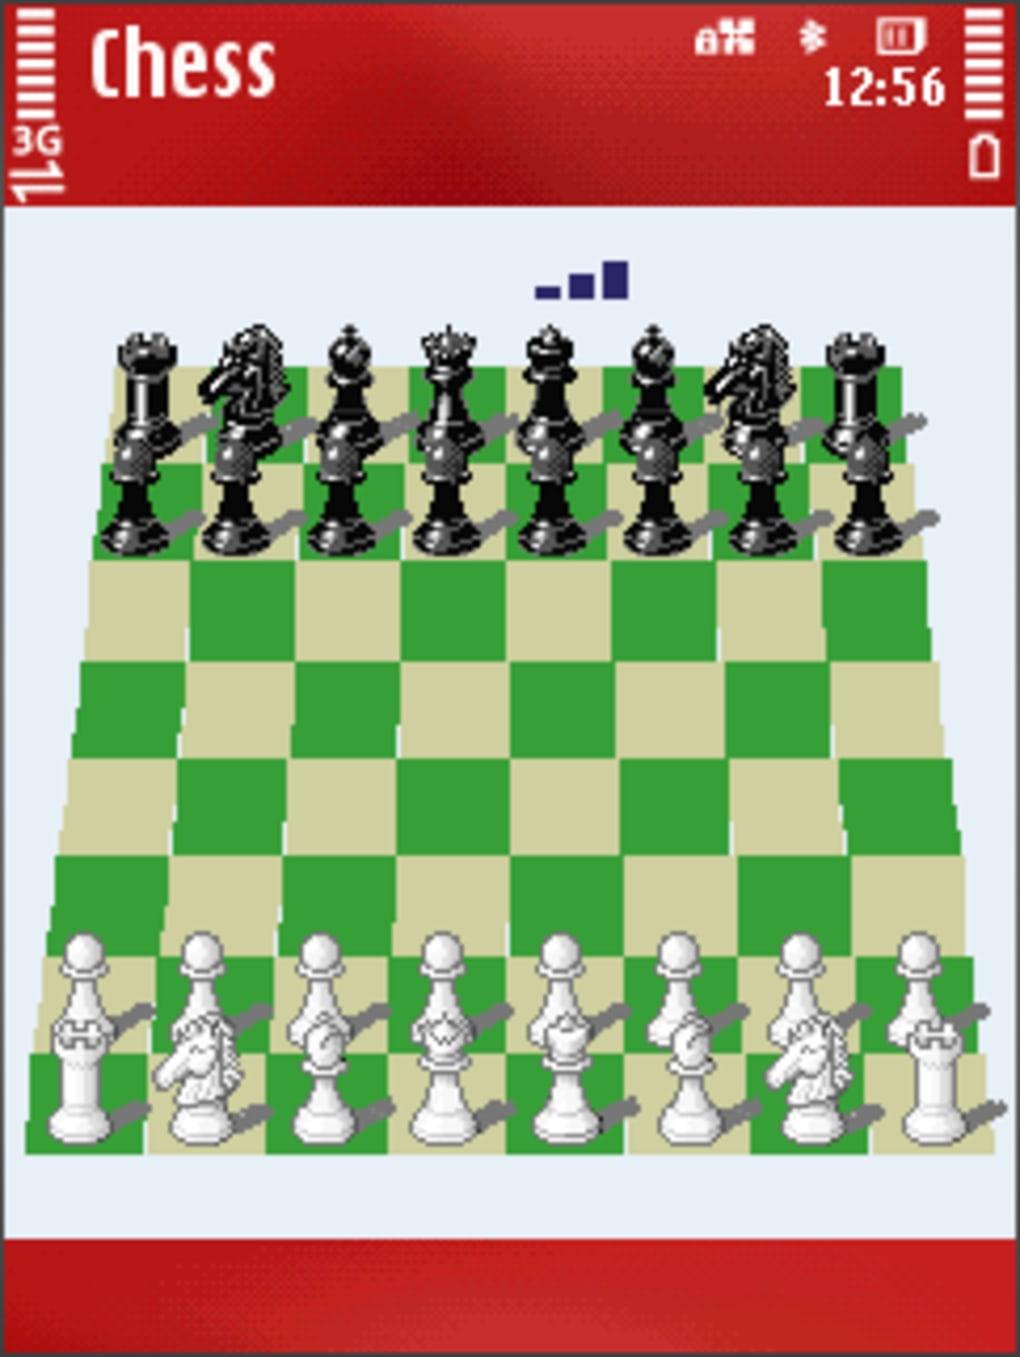 jogo de xadrez gratis para celular java